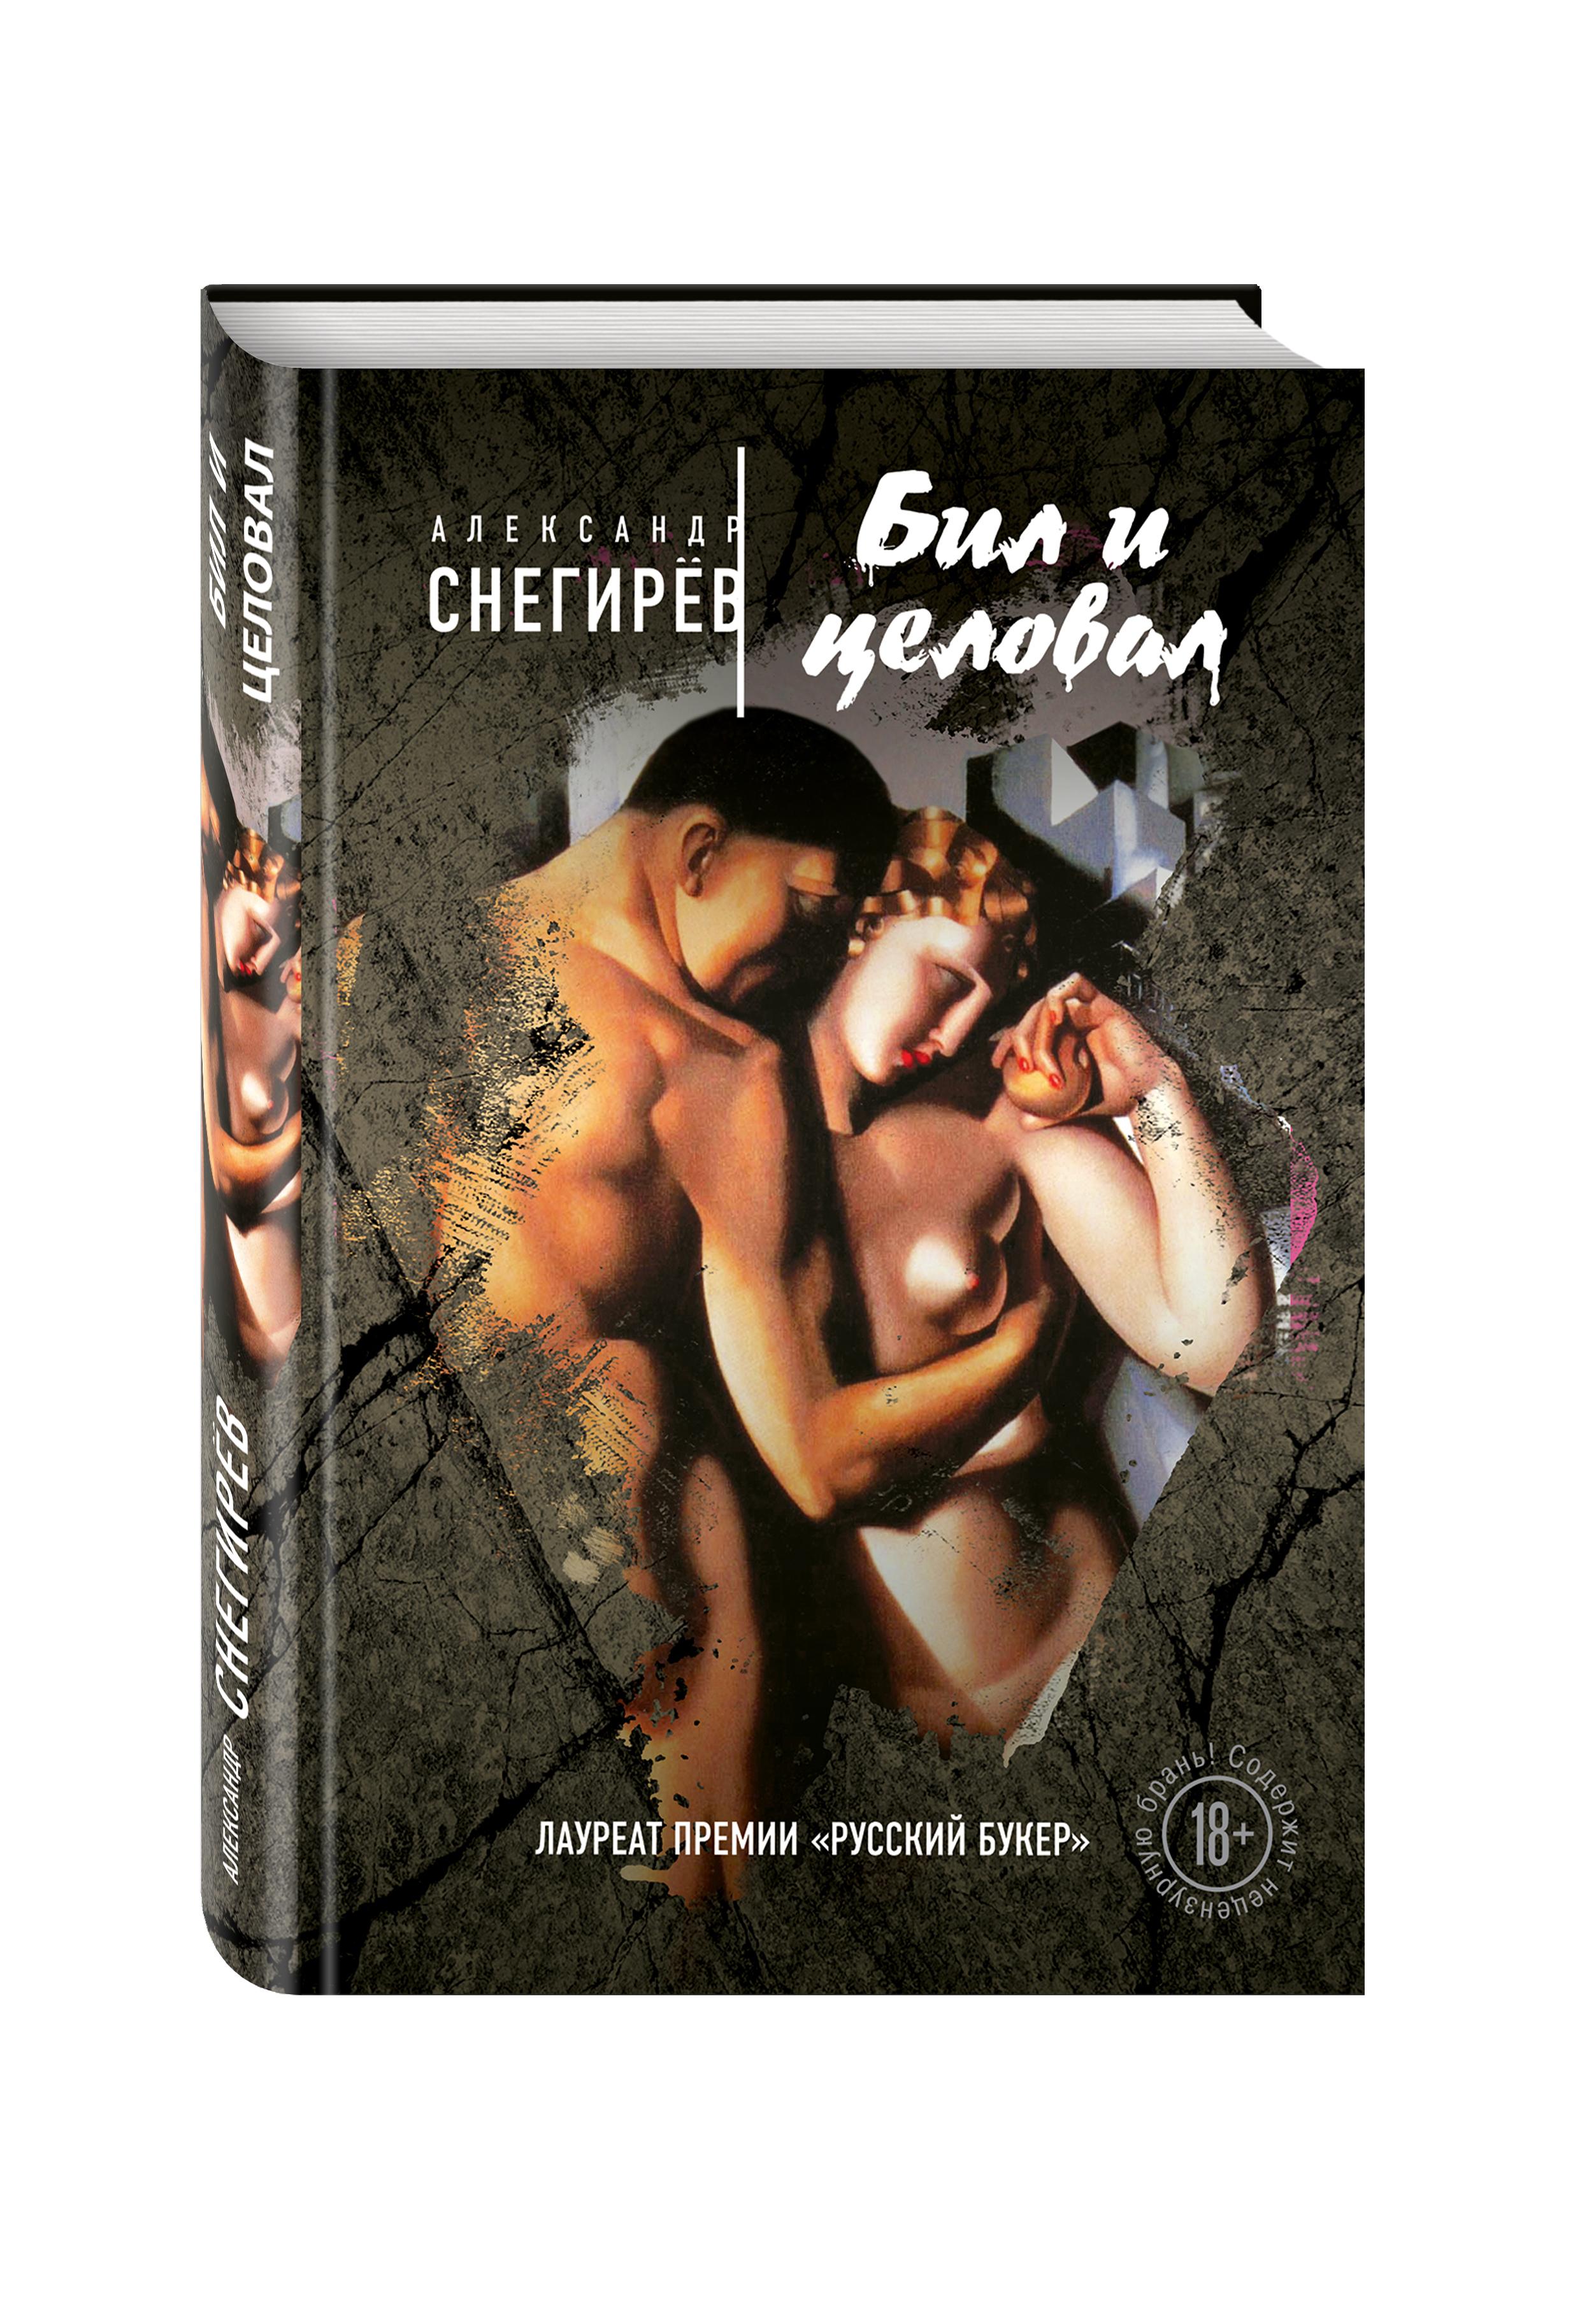 Александр Снегирёв Бил и целовал александр снегирёв как же её звали сборник